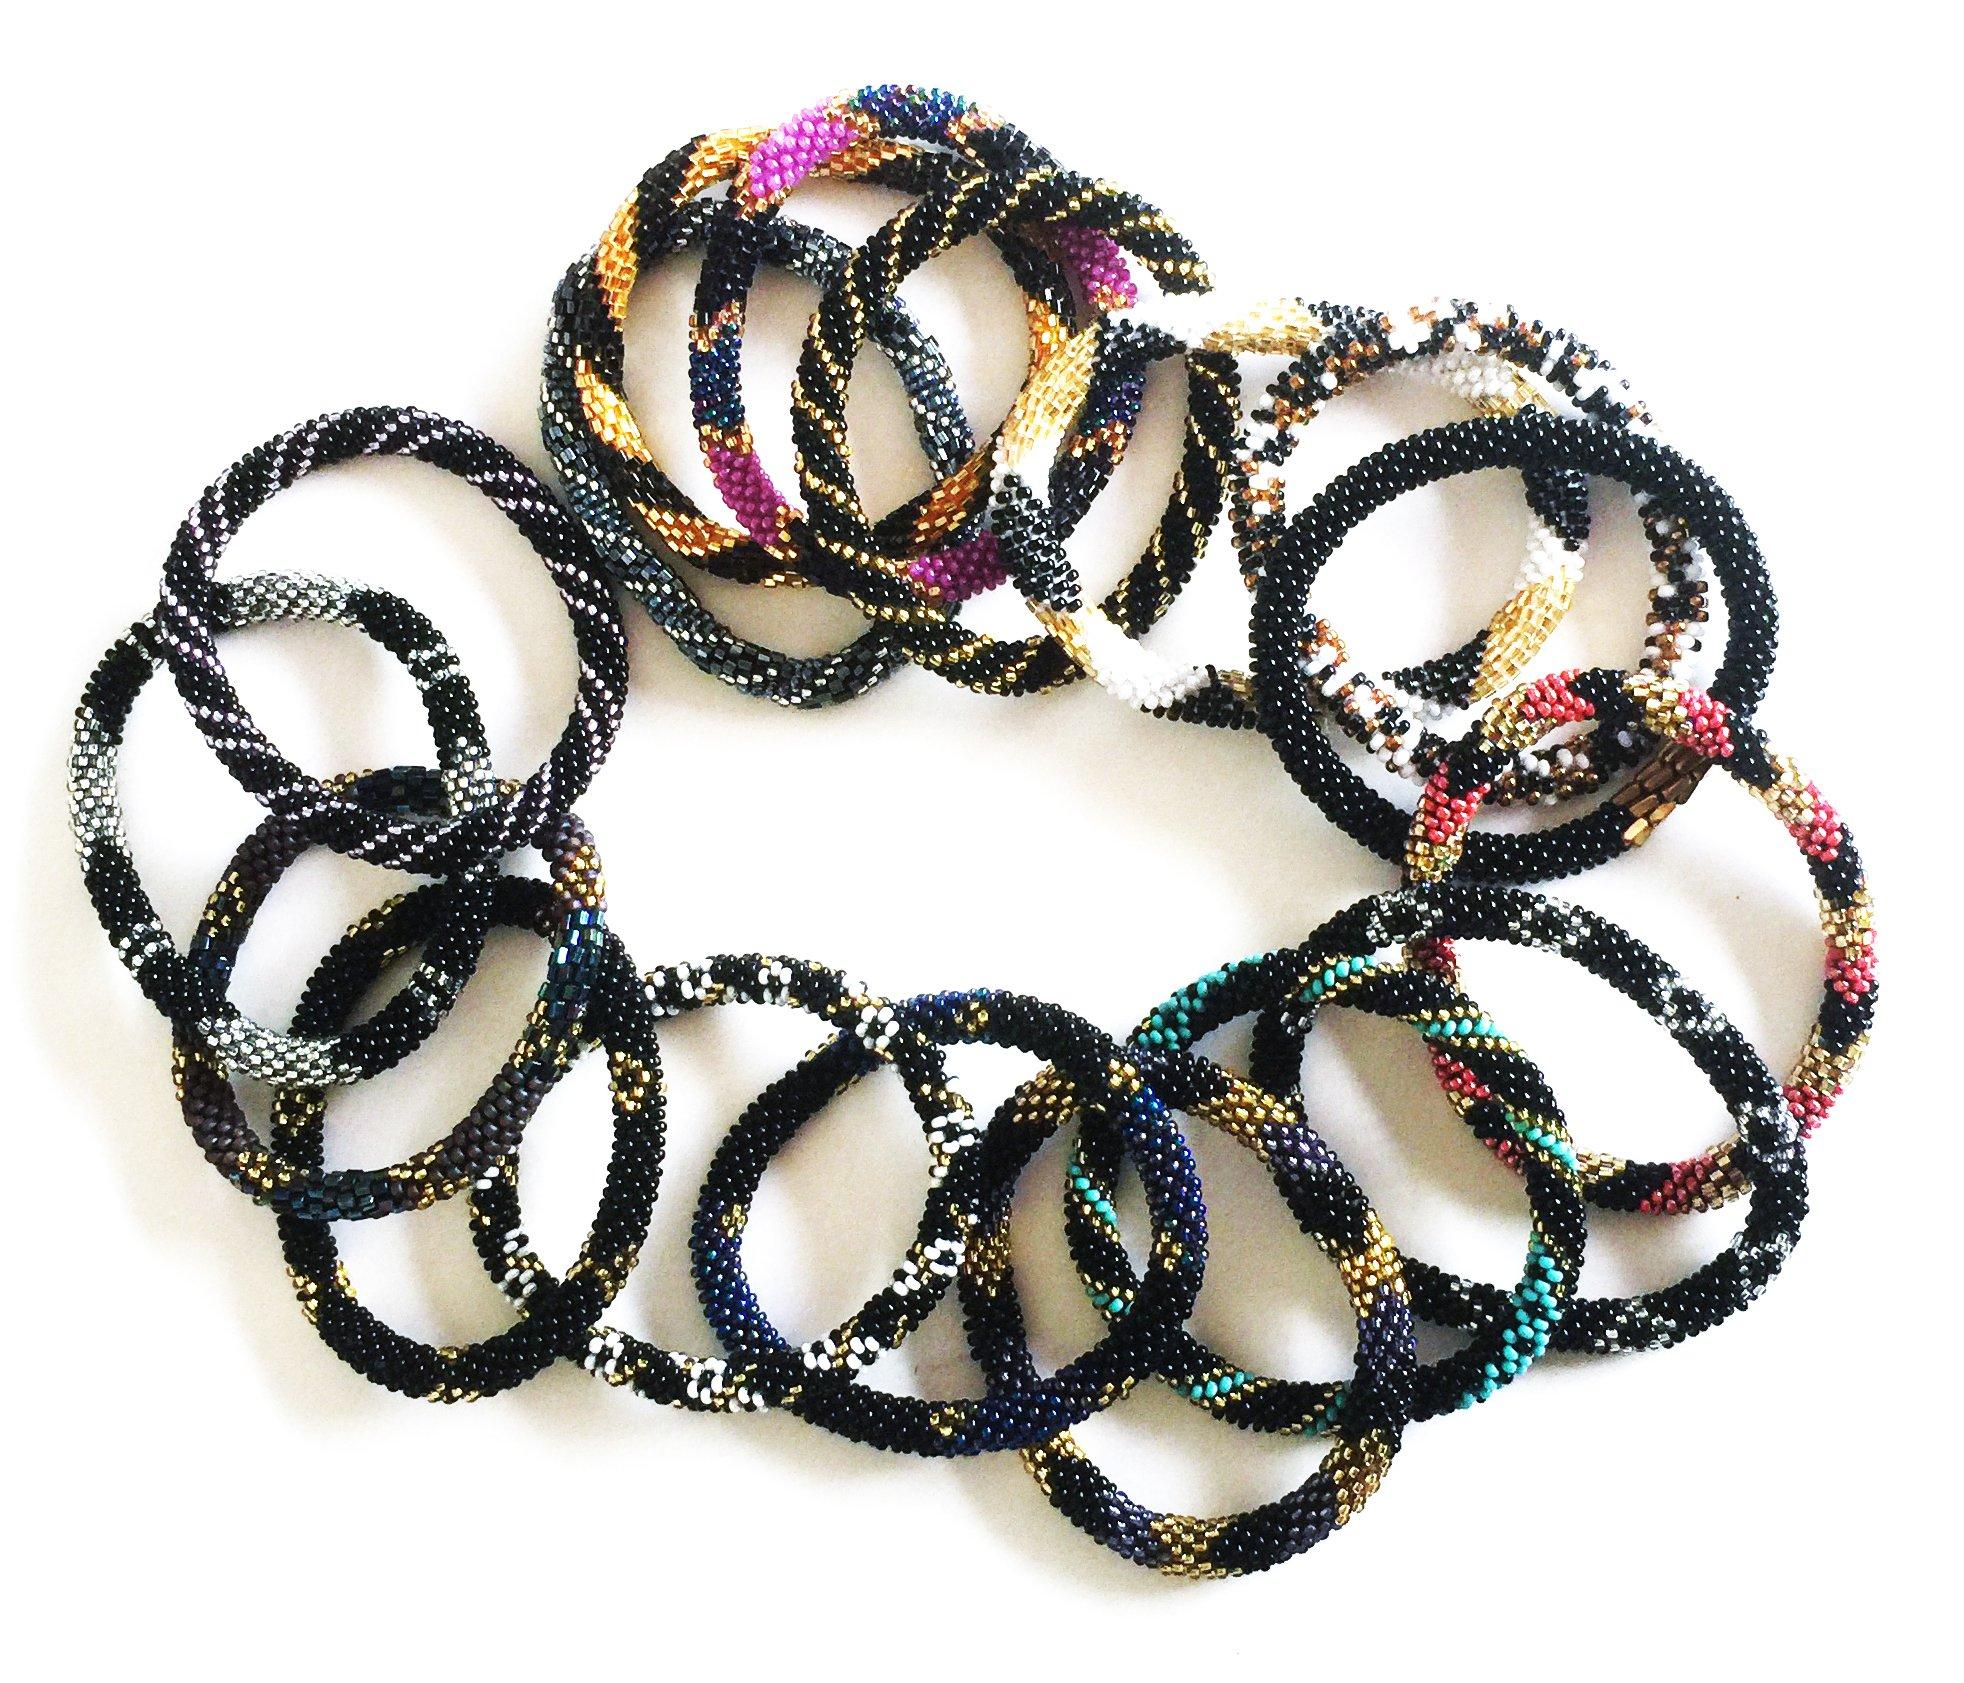 WigsPedia Handmade Crochet Glass Seed Bead Nepal Roll on Boho Bracelet - Wholesale Black Scheme (12 Pieces Black Bracelets)